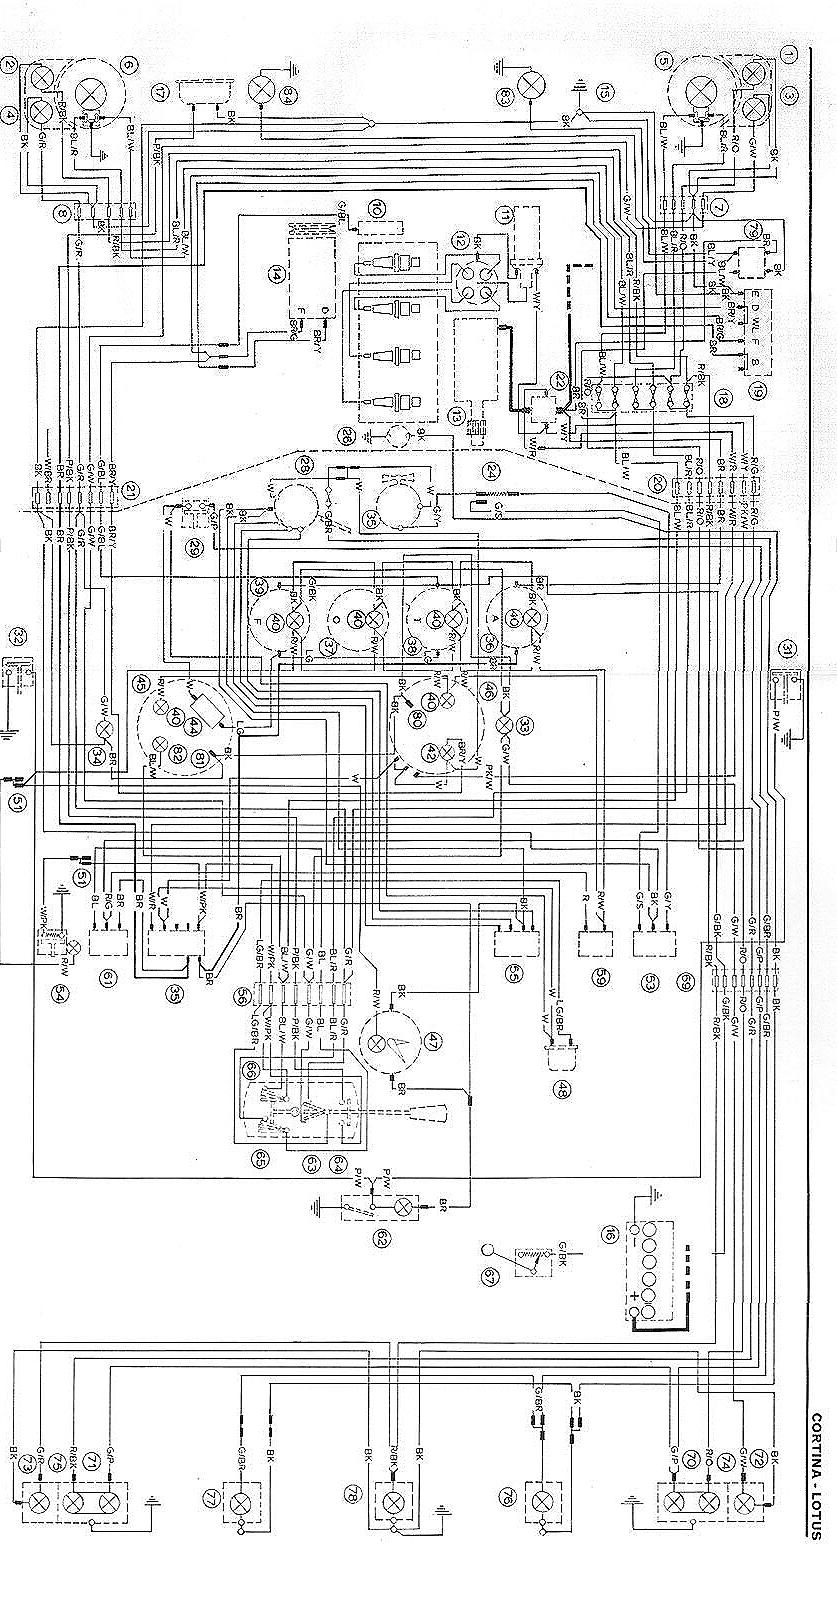 3 Wire Headlight Wiring Lotus Cortina Wiring Diagrams